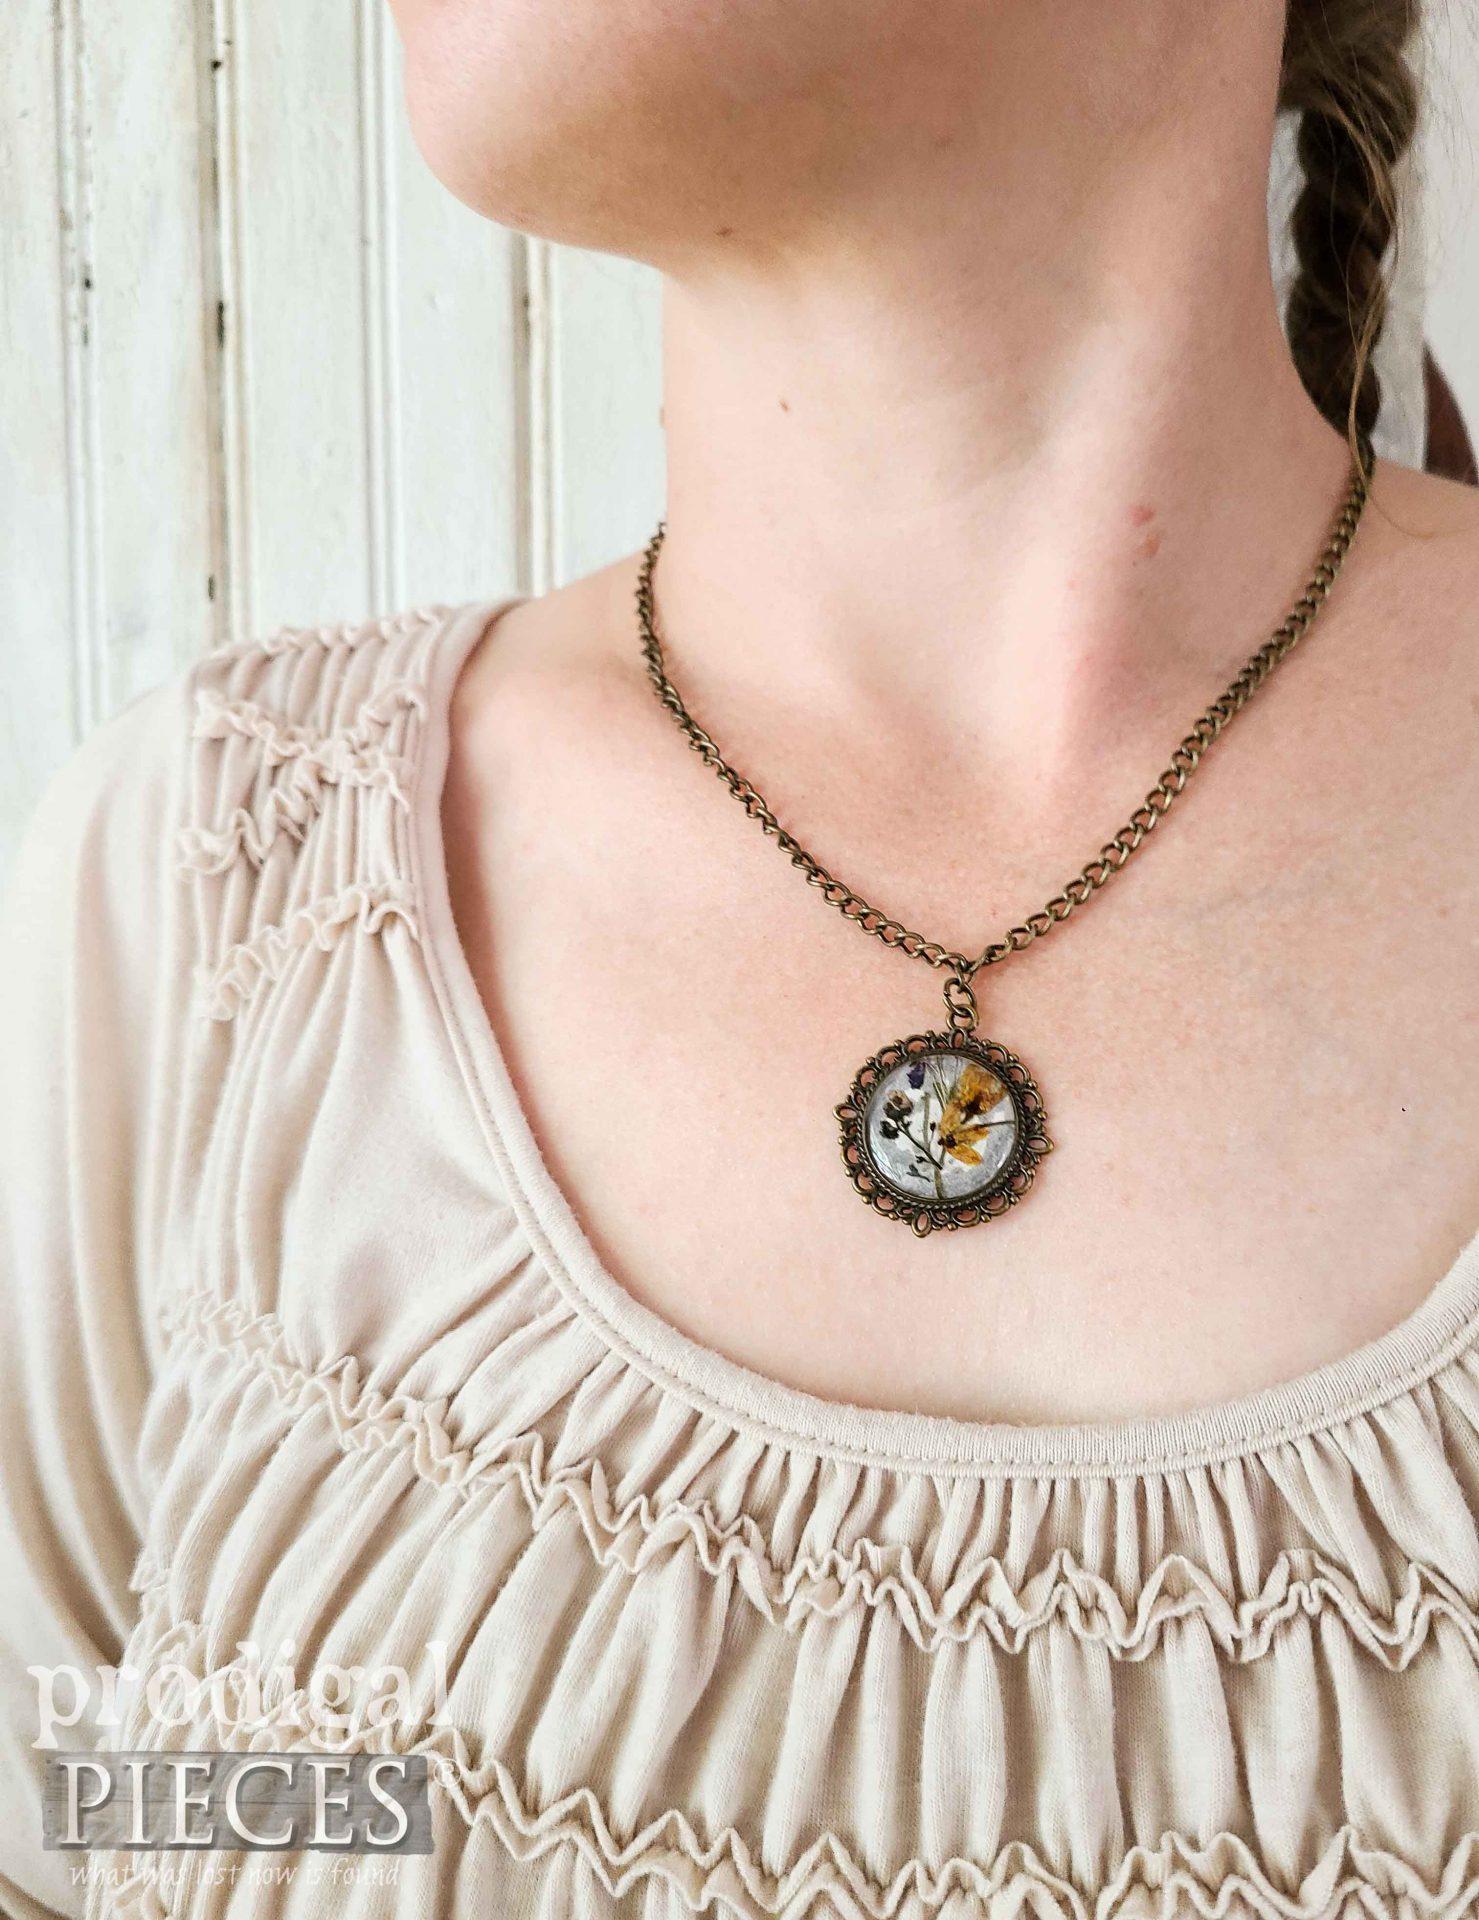 Handmade DIY Resin Necklace Pendant by Larissa of Prodigal Pieces   prodigalpieces.com #prodigalpieces #diy #jewelry #handmade #giftidea